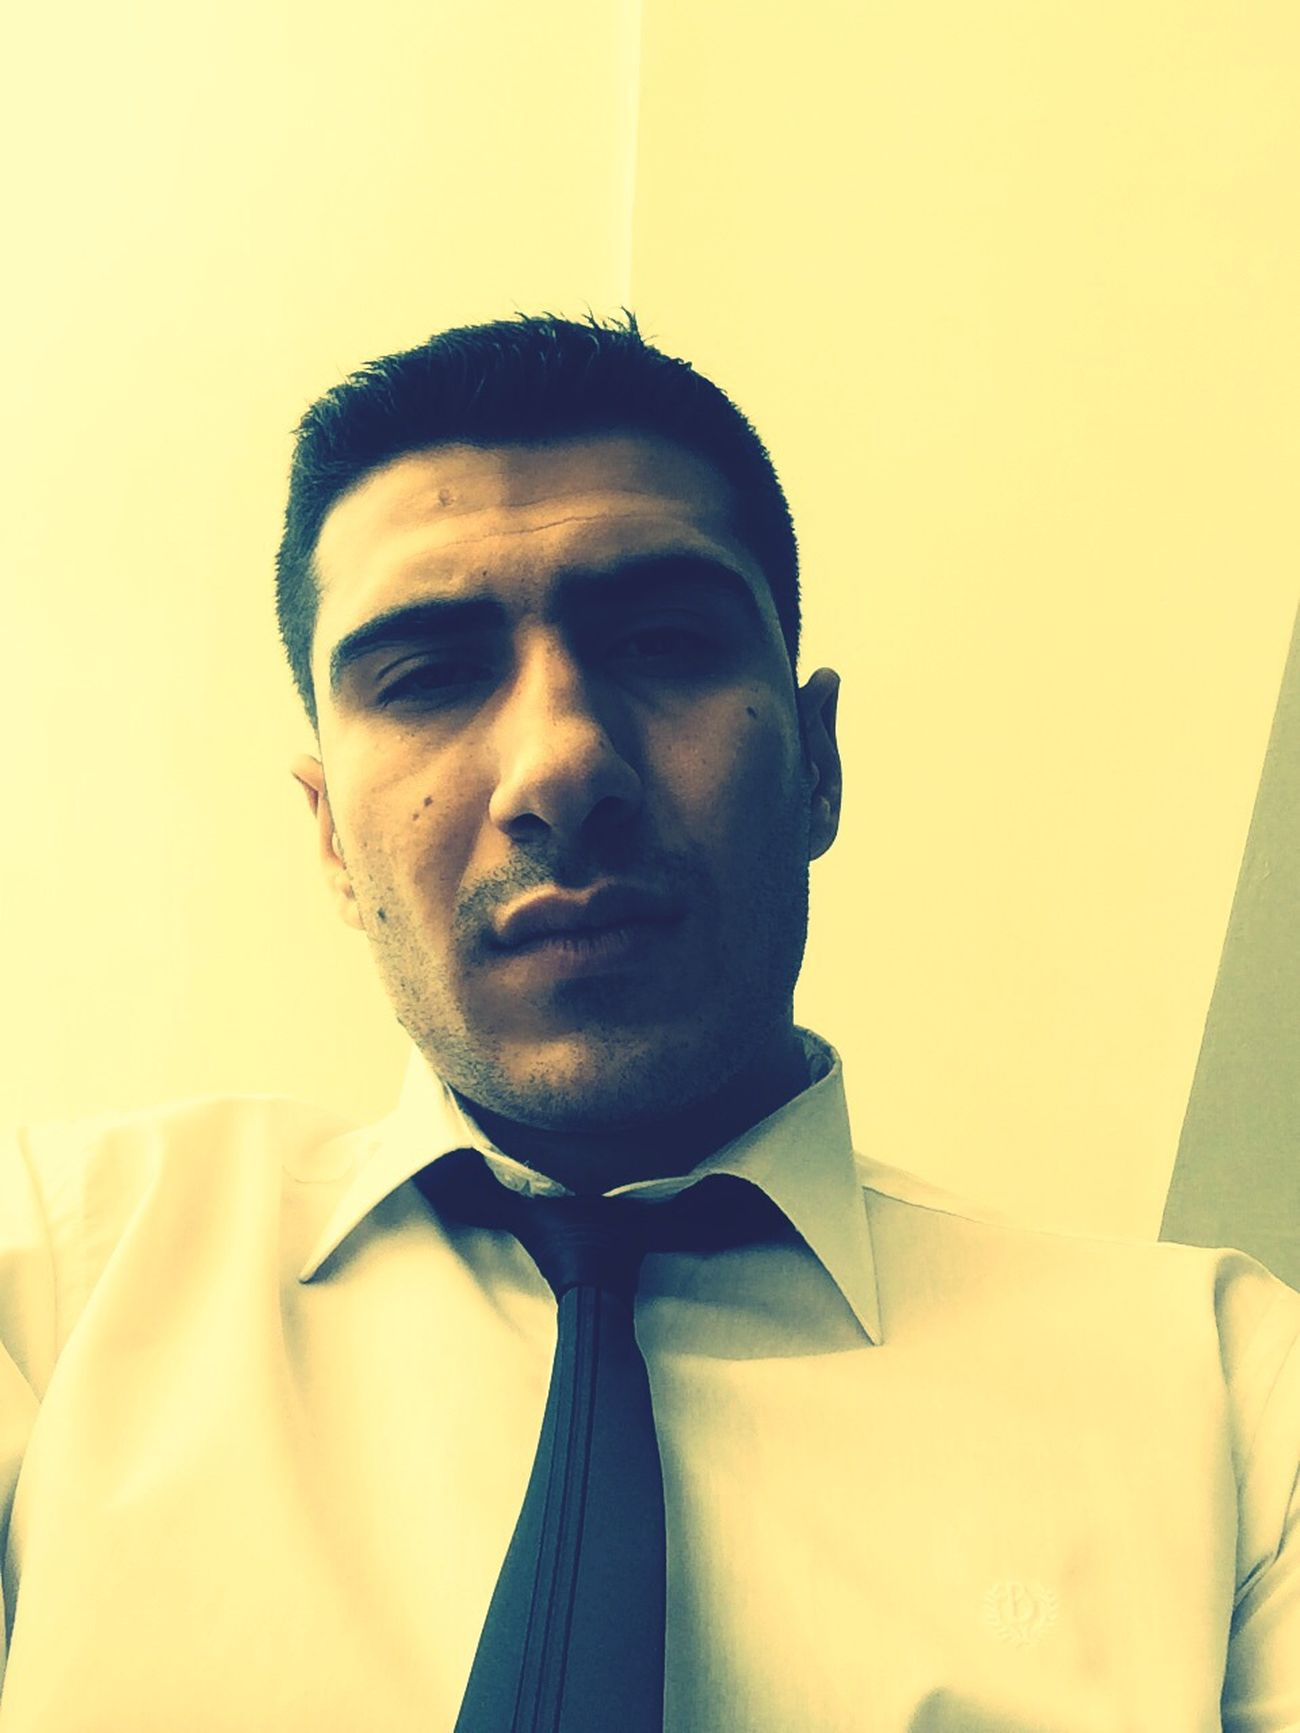 Wee Wish You Ramadan Kareem SecurityGuard Good Morning Self Portrait Hallelujah